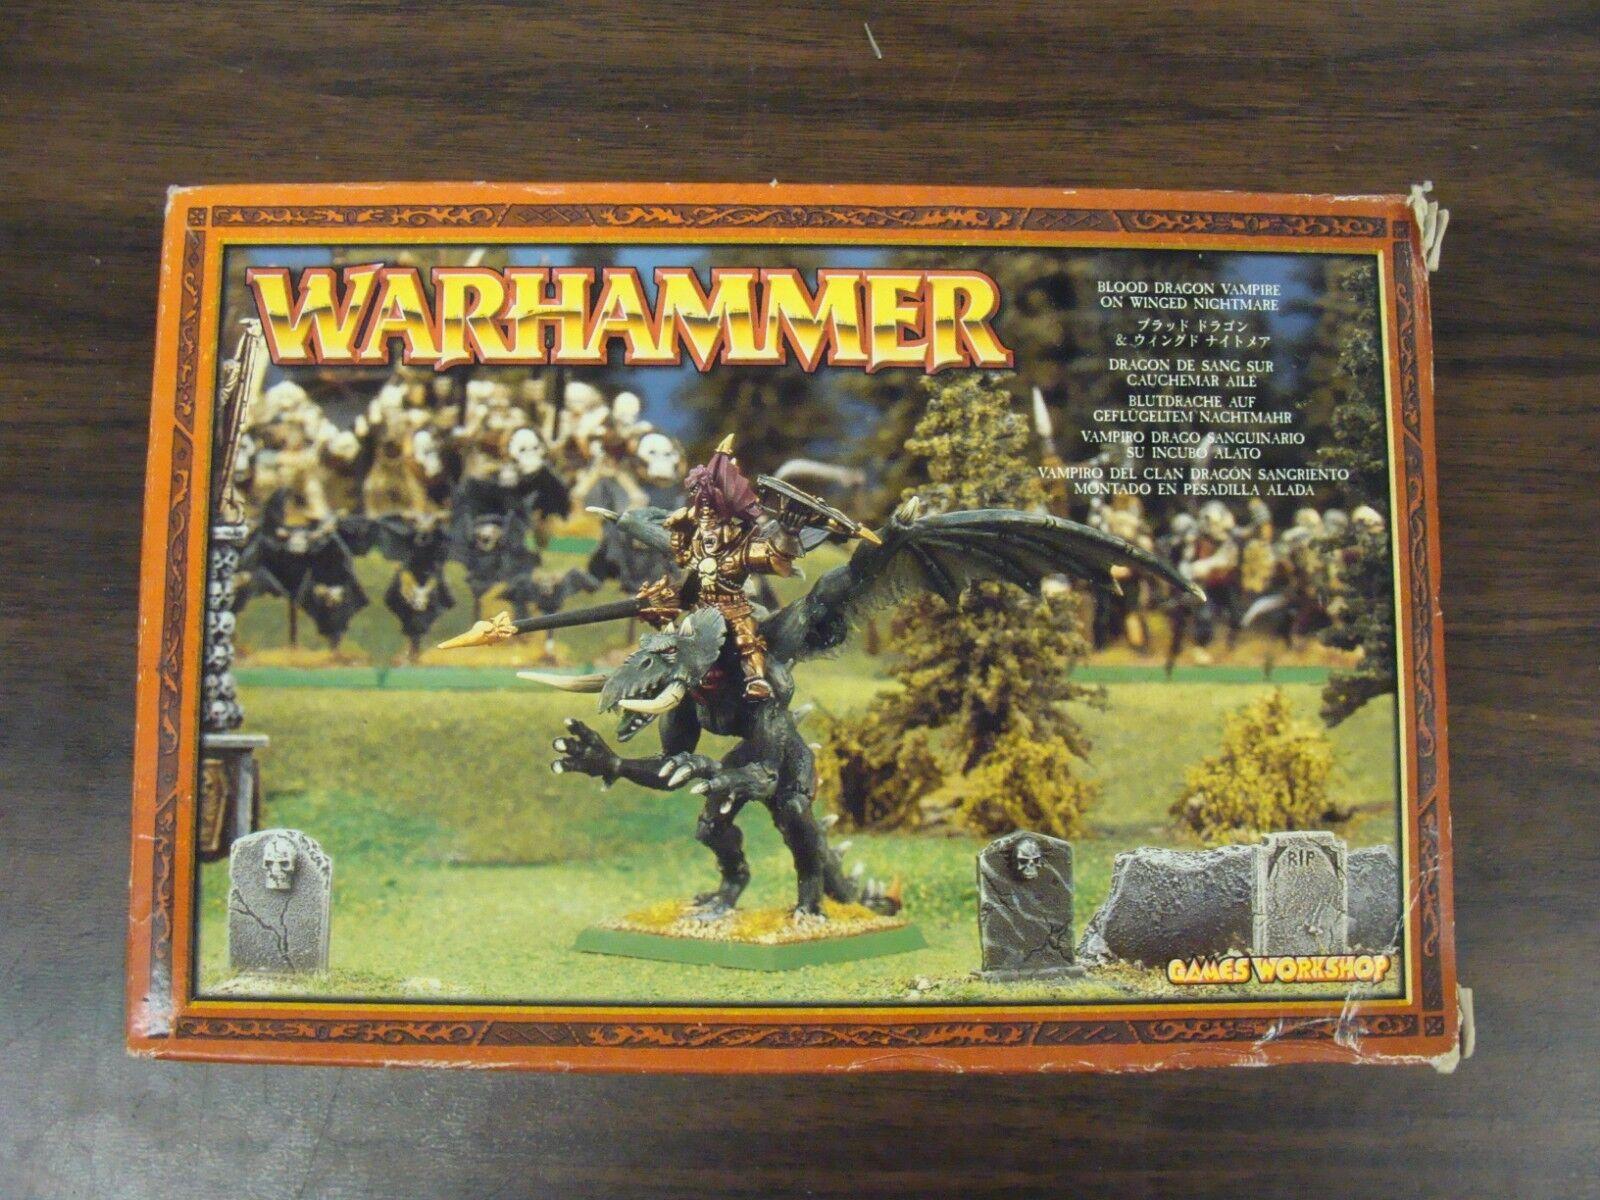 Bloddrake Vampyr på vingeed Nightmare Warhammer Metal